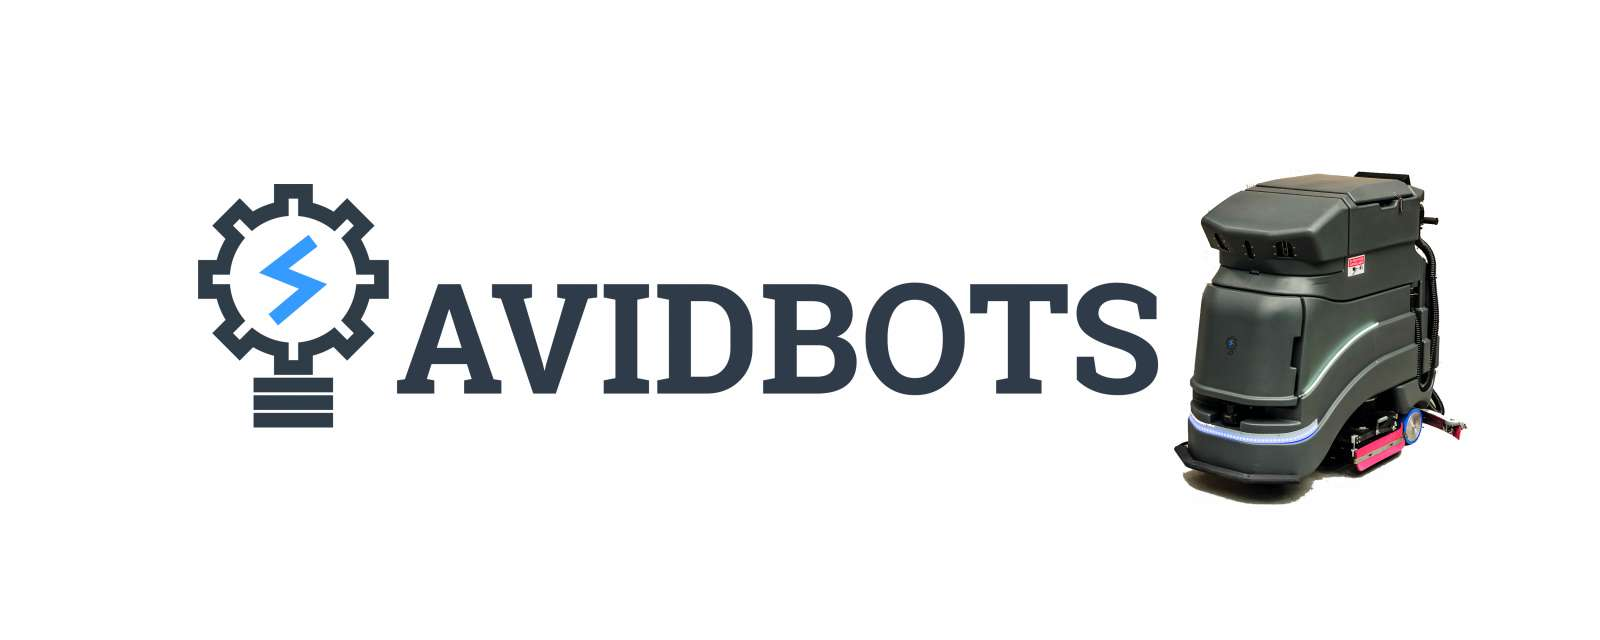 Avidbots